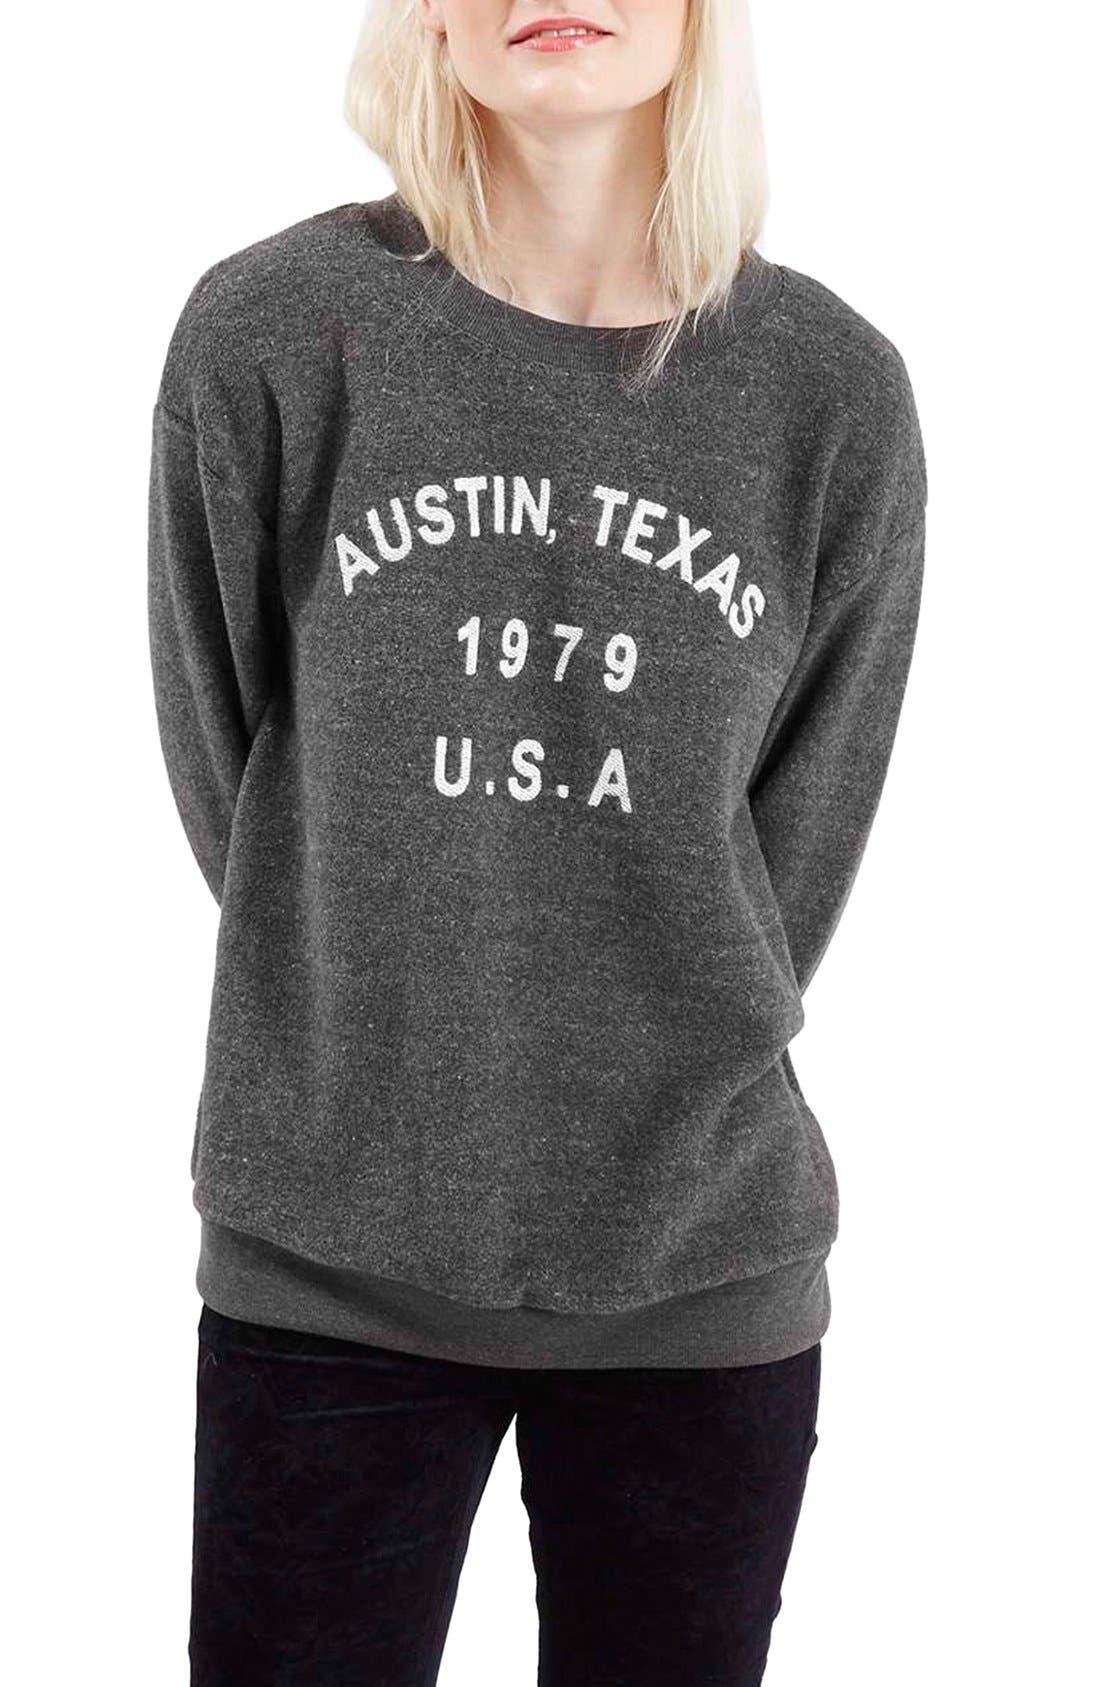 Alternate Image 1 Selected - Topshop 'Austin, Texas' Crewneck Sweatshirt